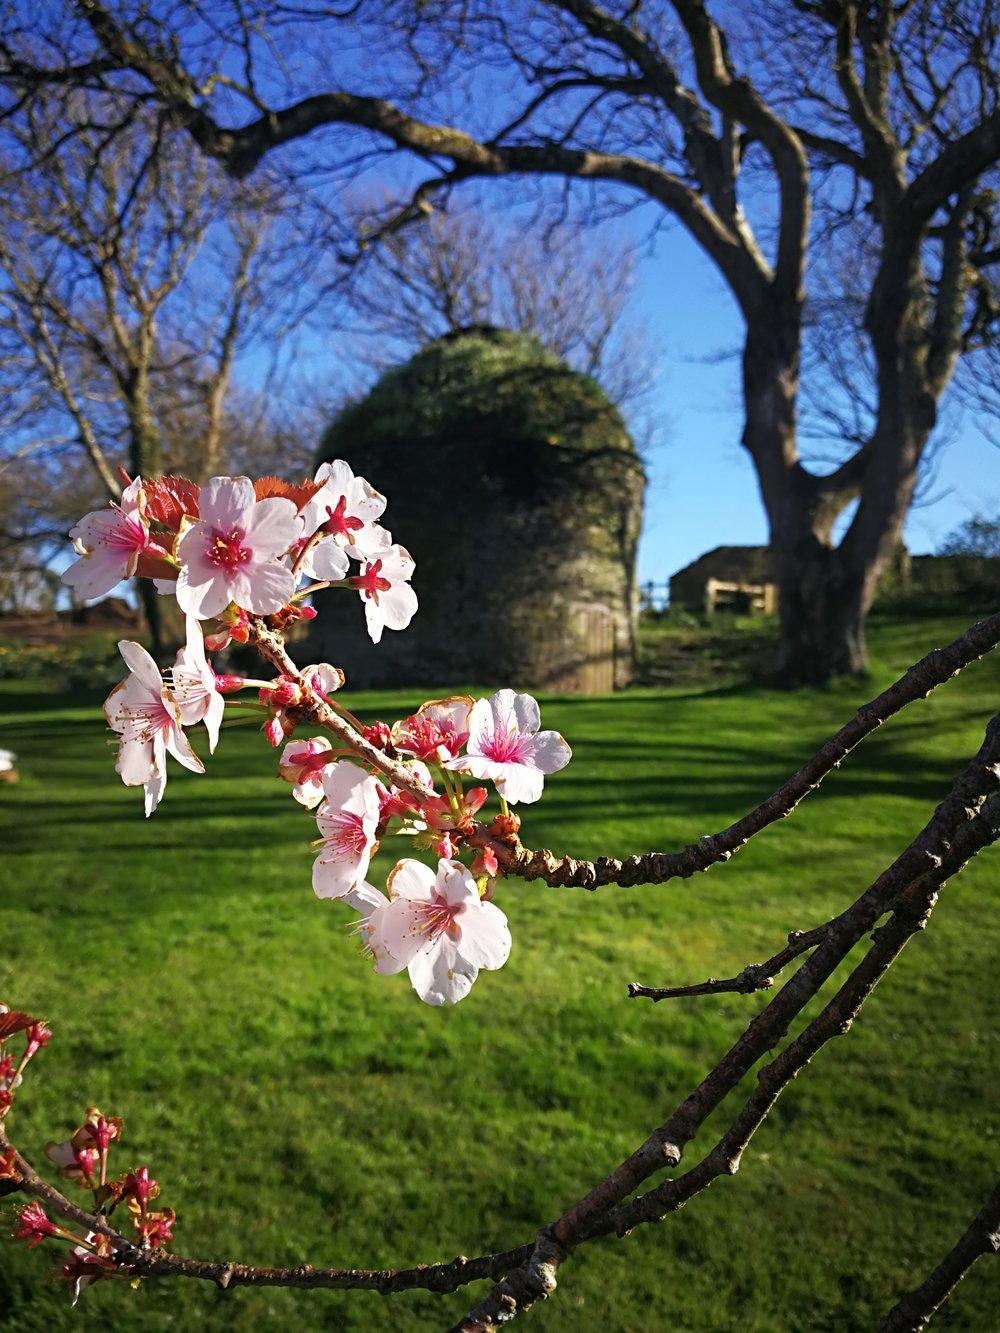 SpringCornwall.jpg